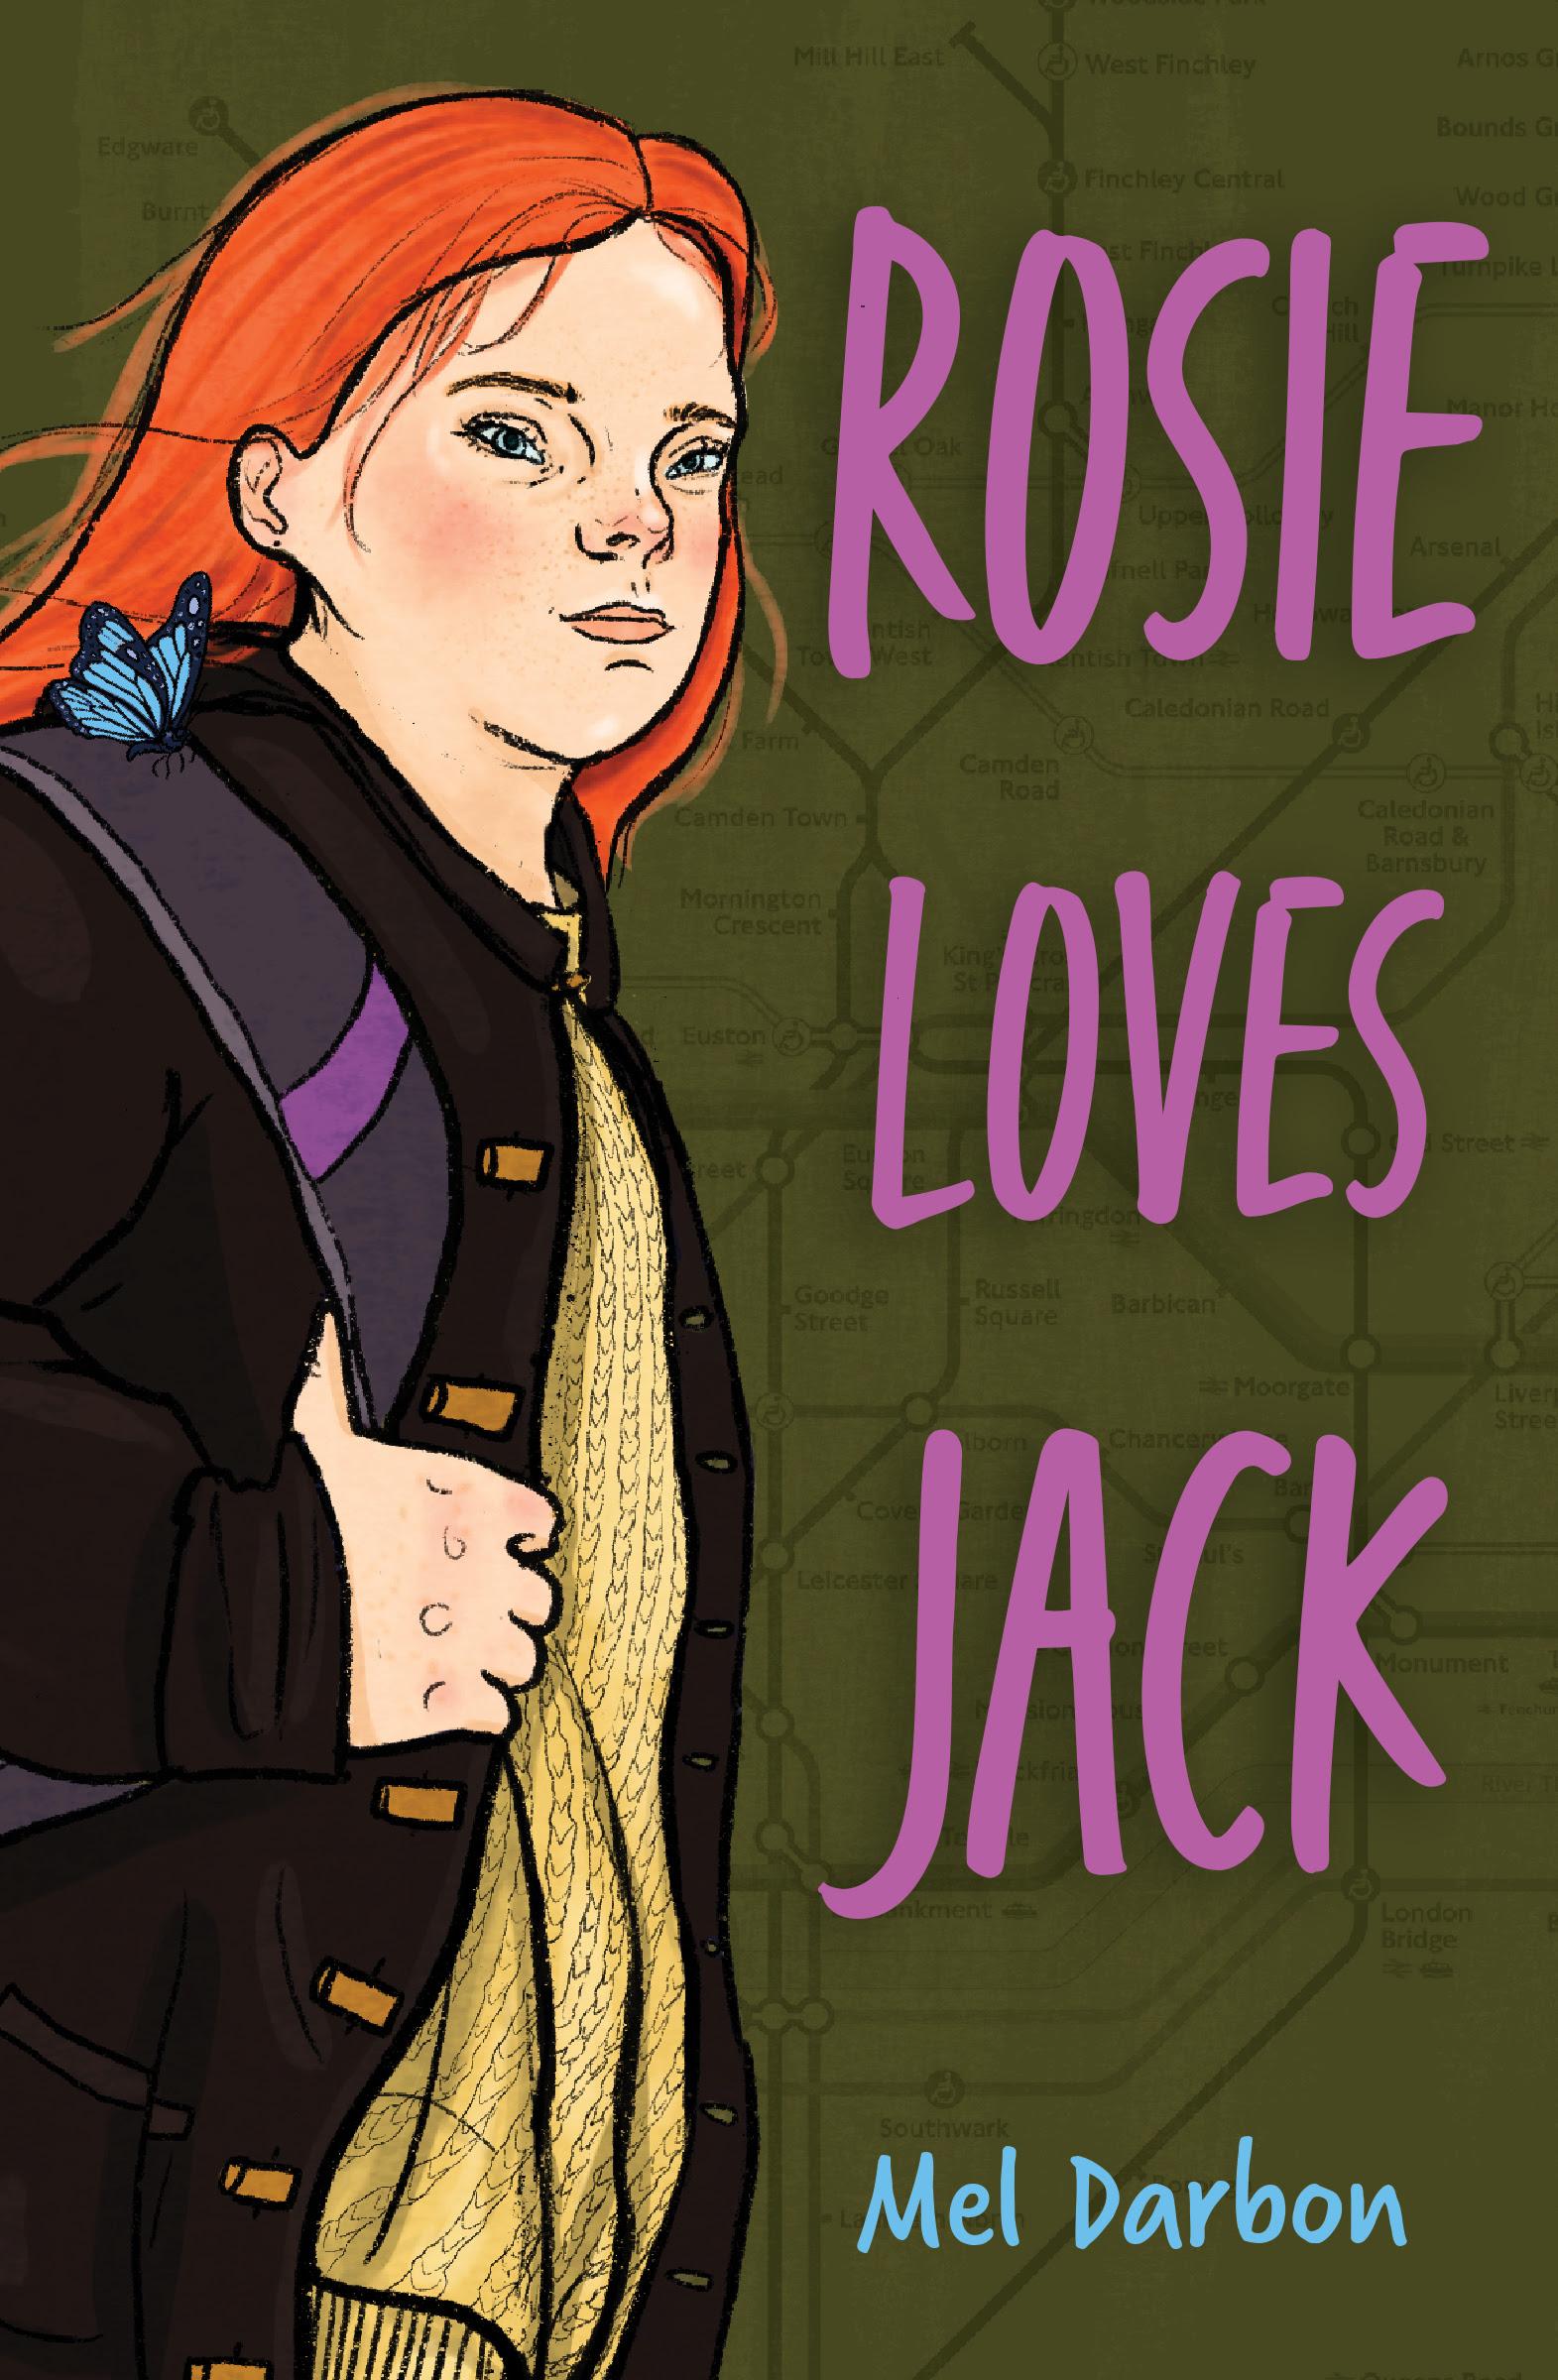 Rosie Loves Jack-COVER.jpg